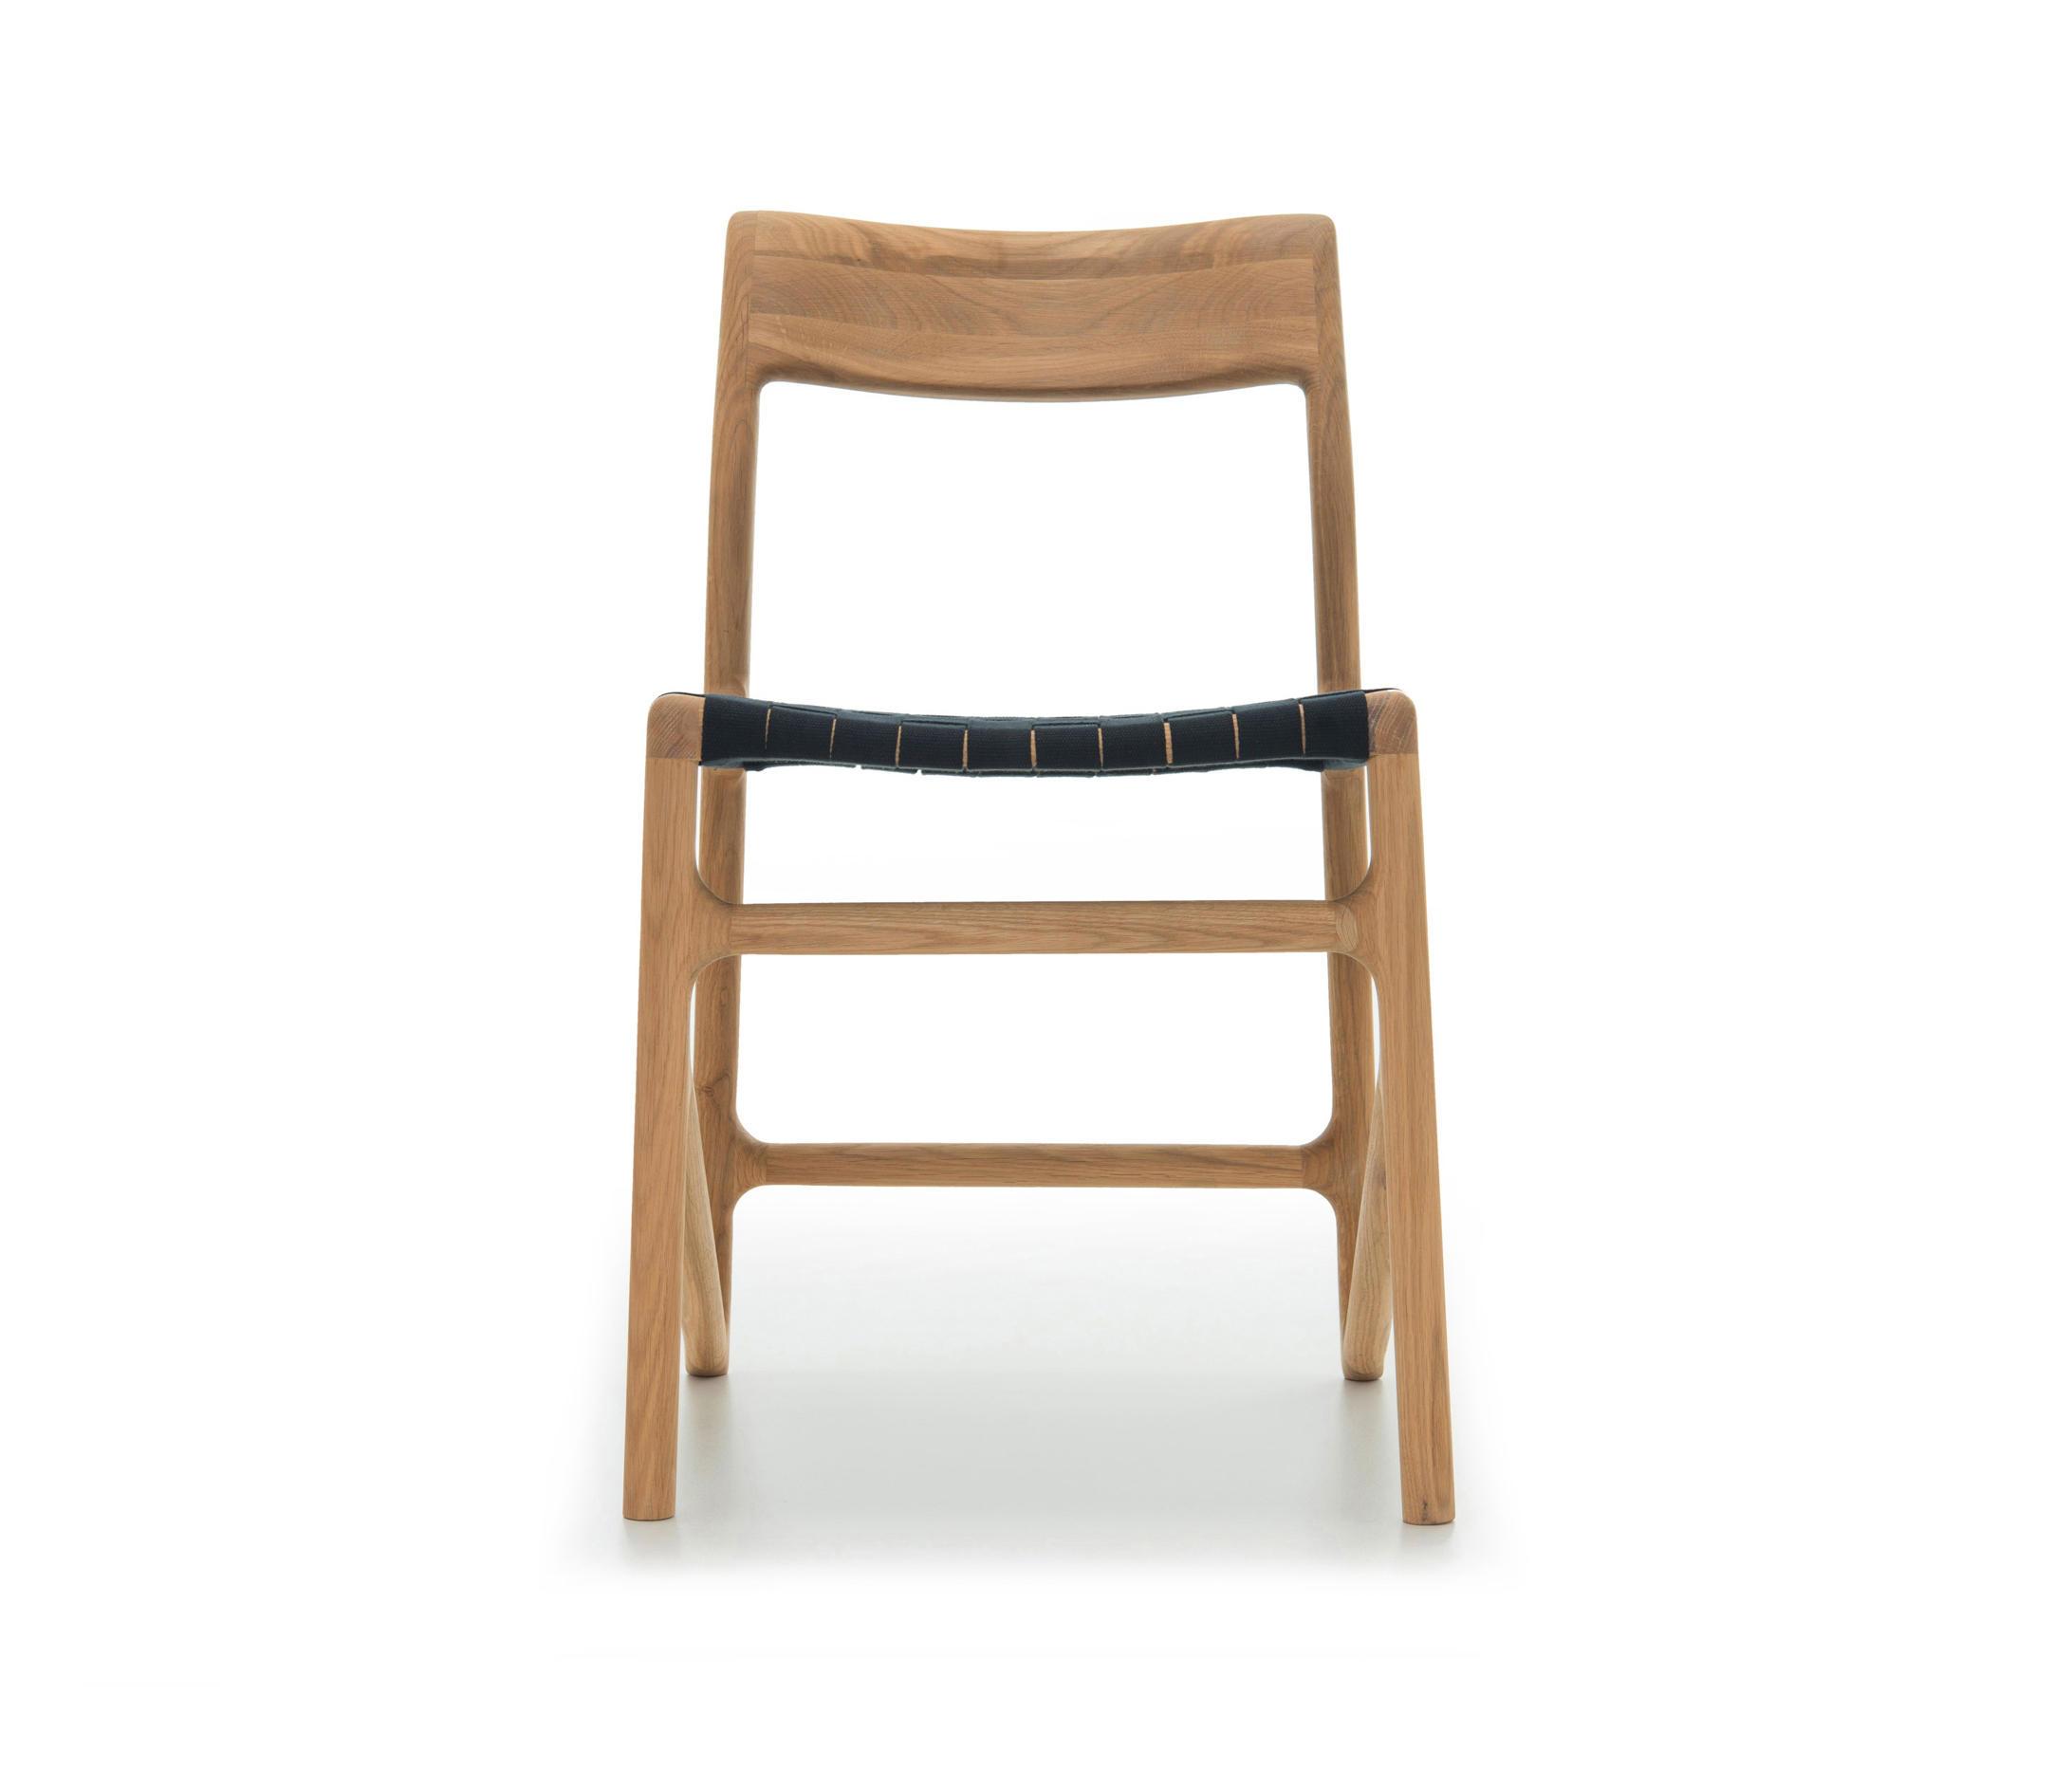 ... Fawn Chair By Gazzda | Chairs ...